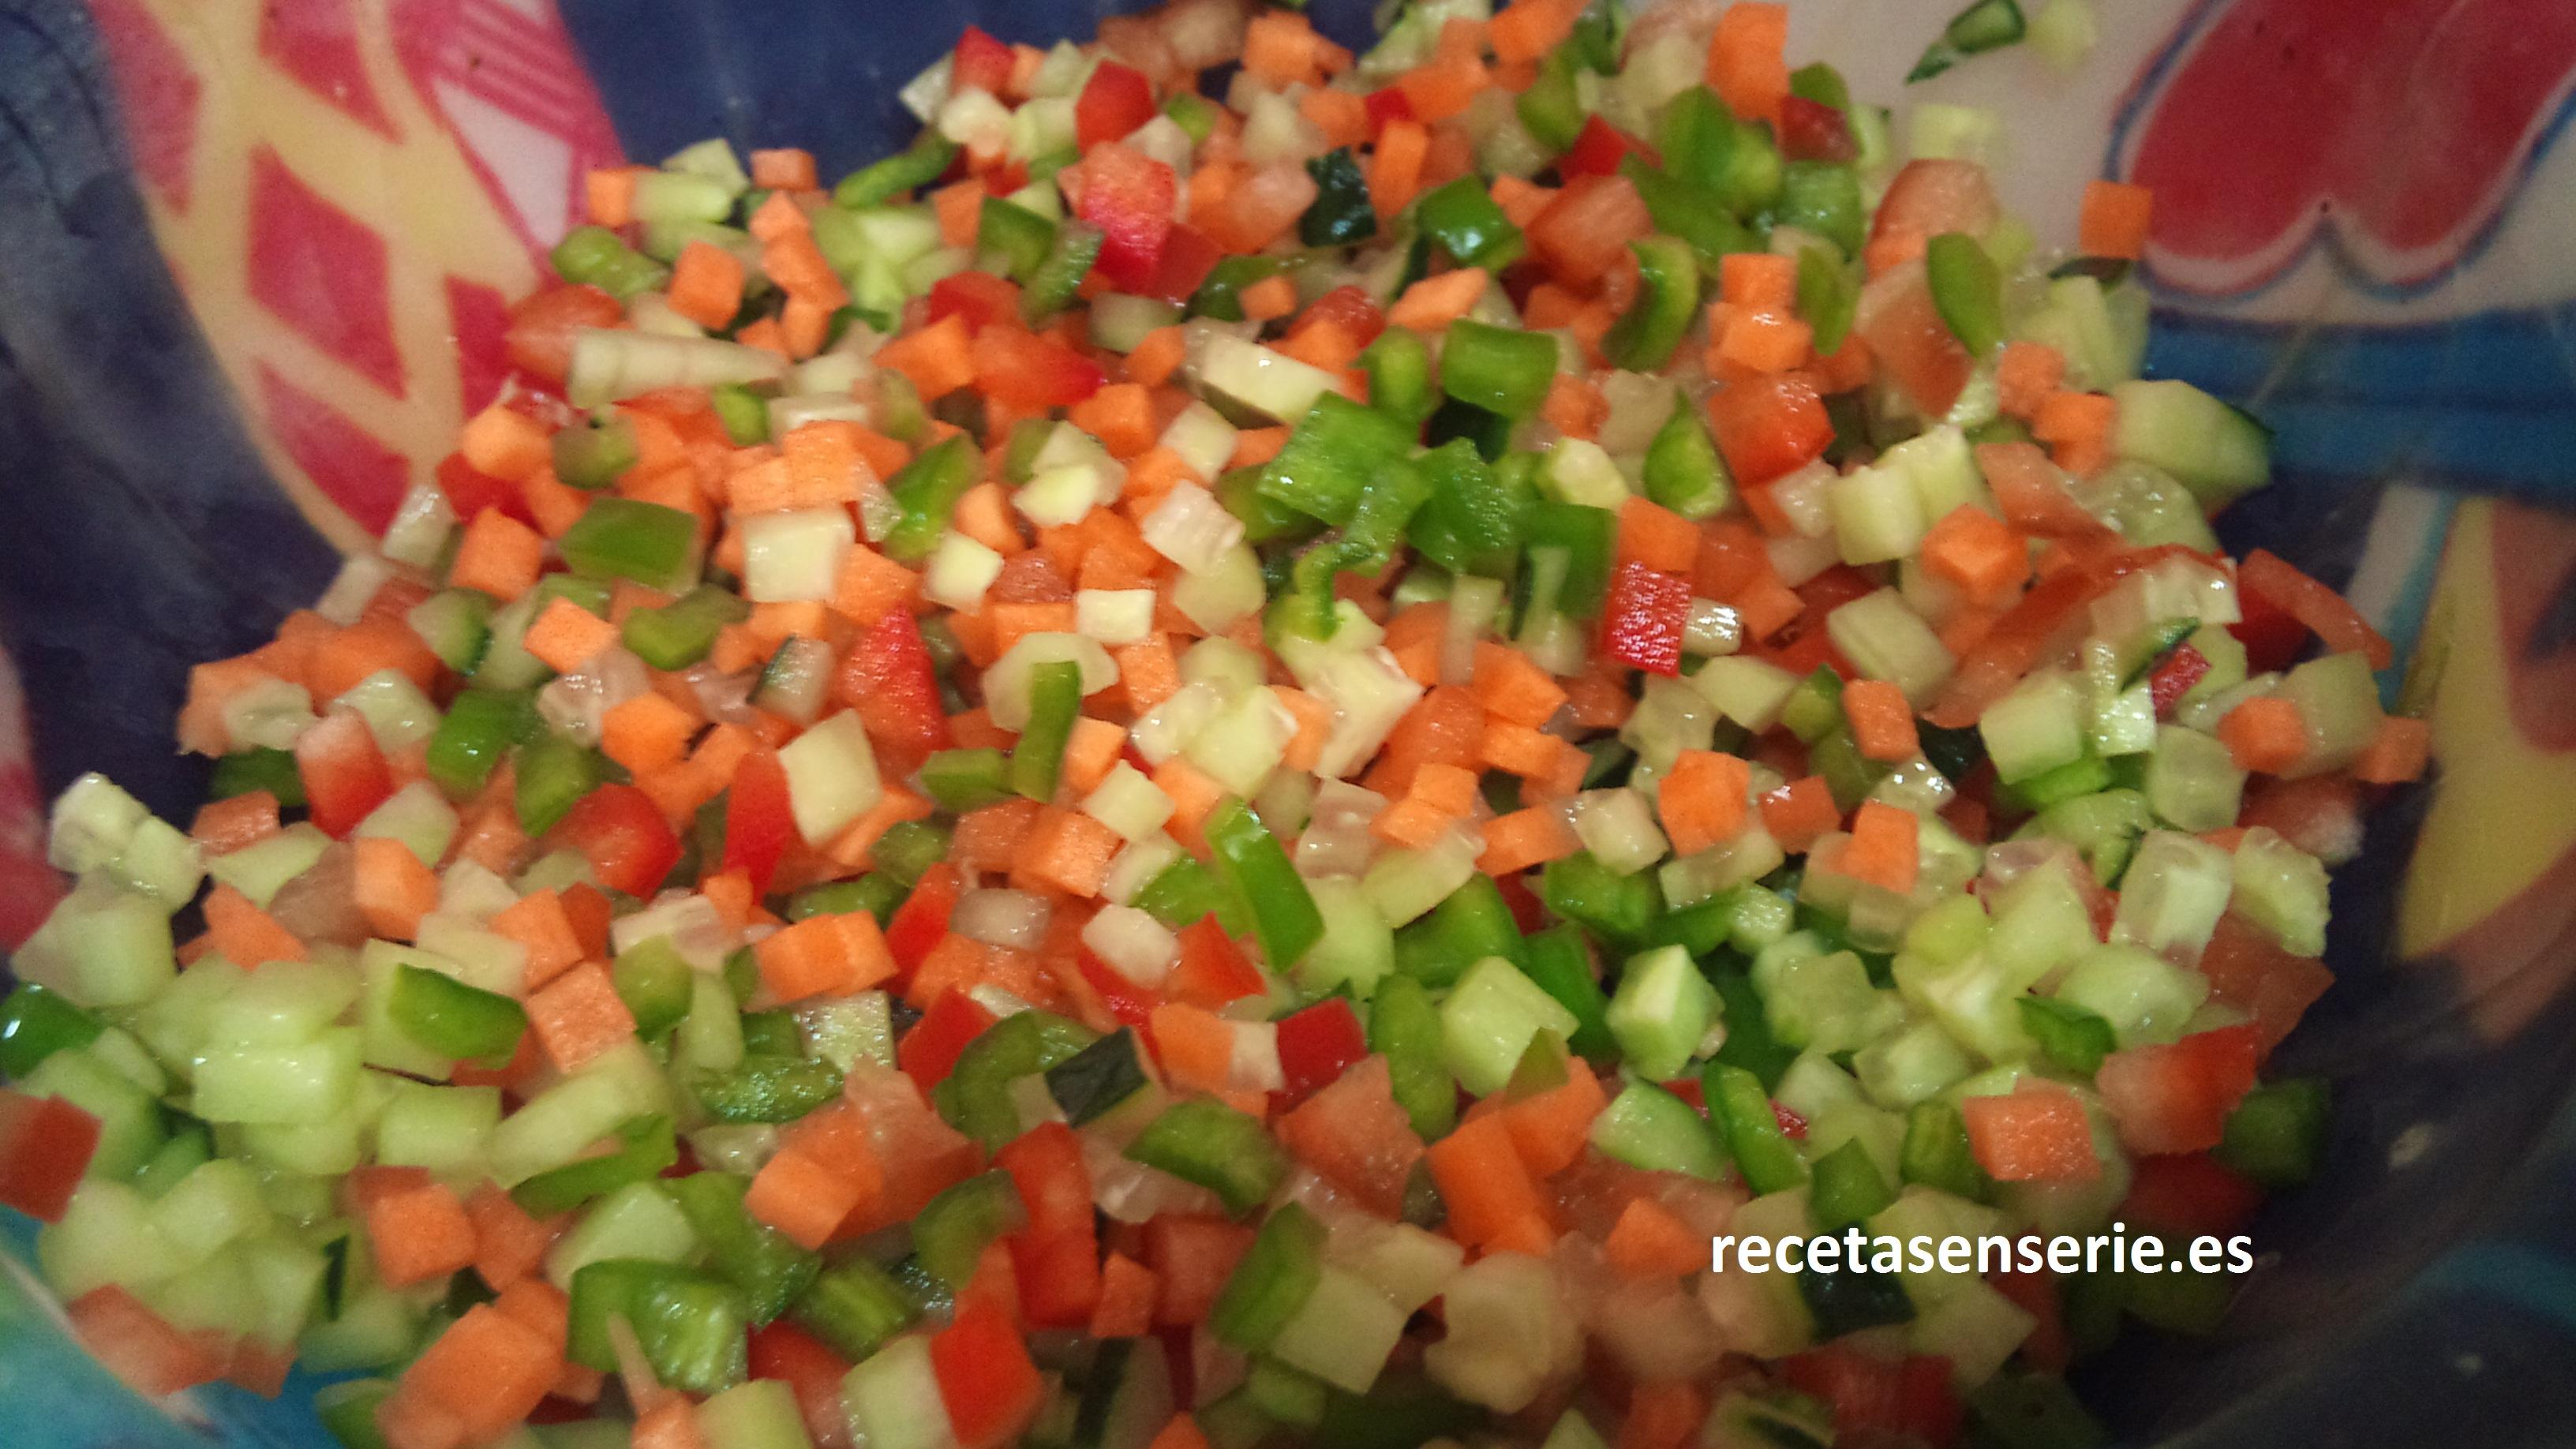 Corte brunoise recetas en serie for Cortes de verduras gastronomia pdf